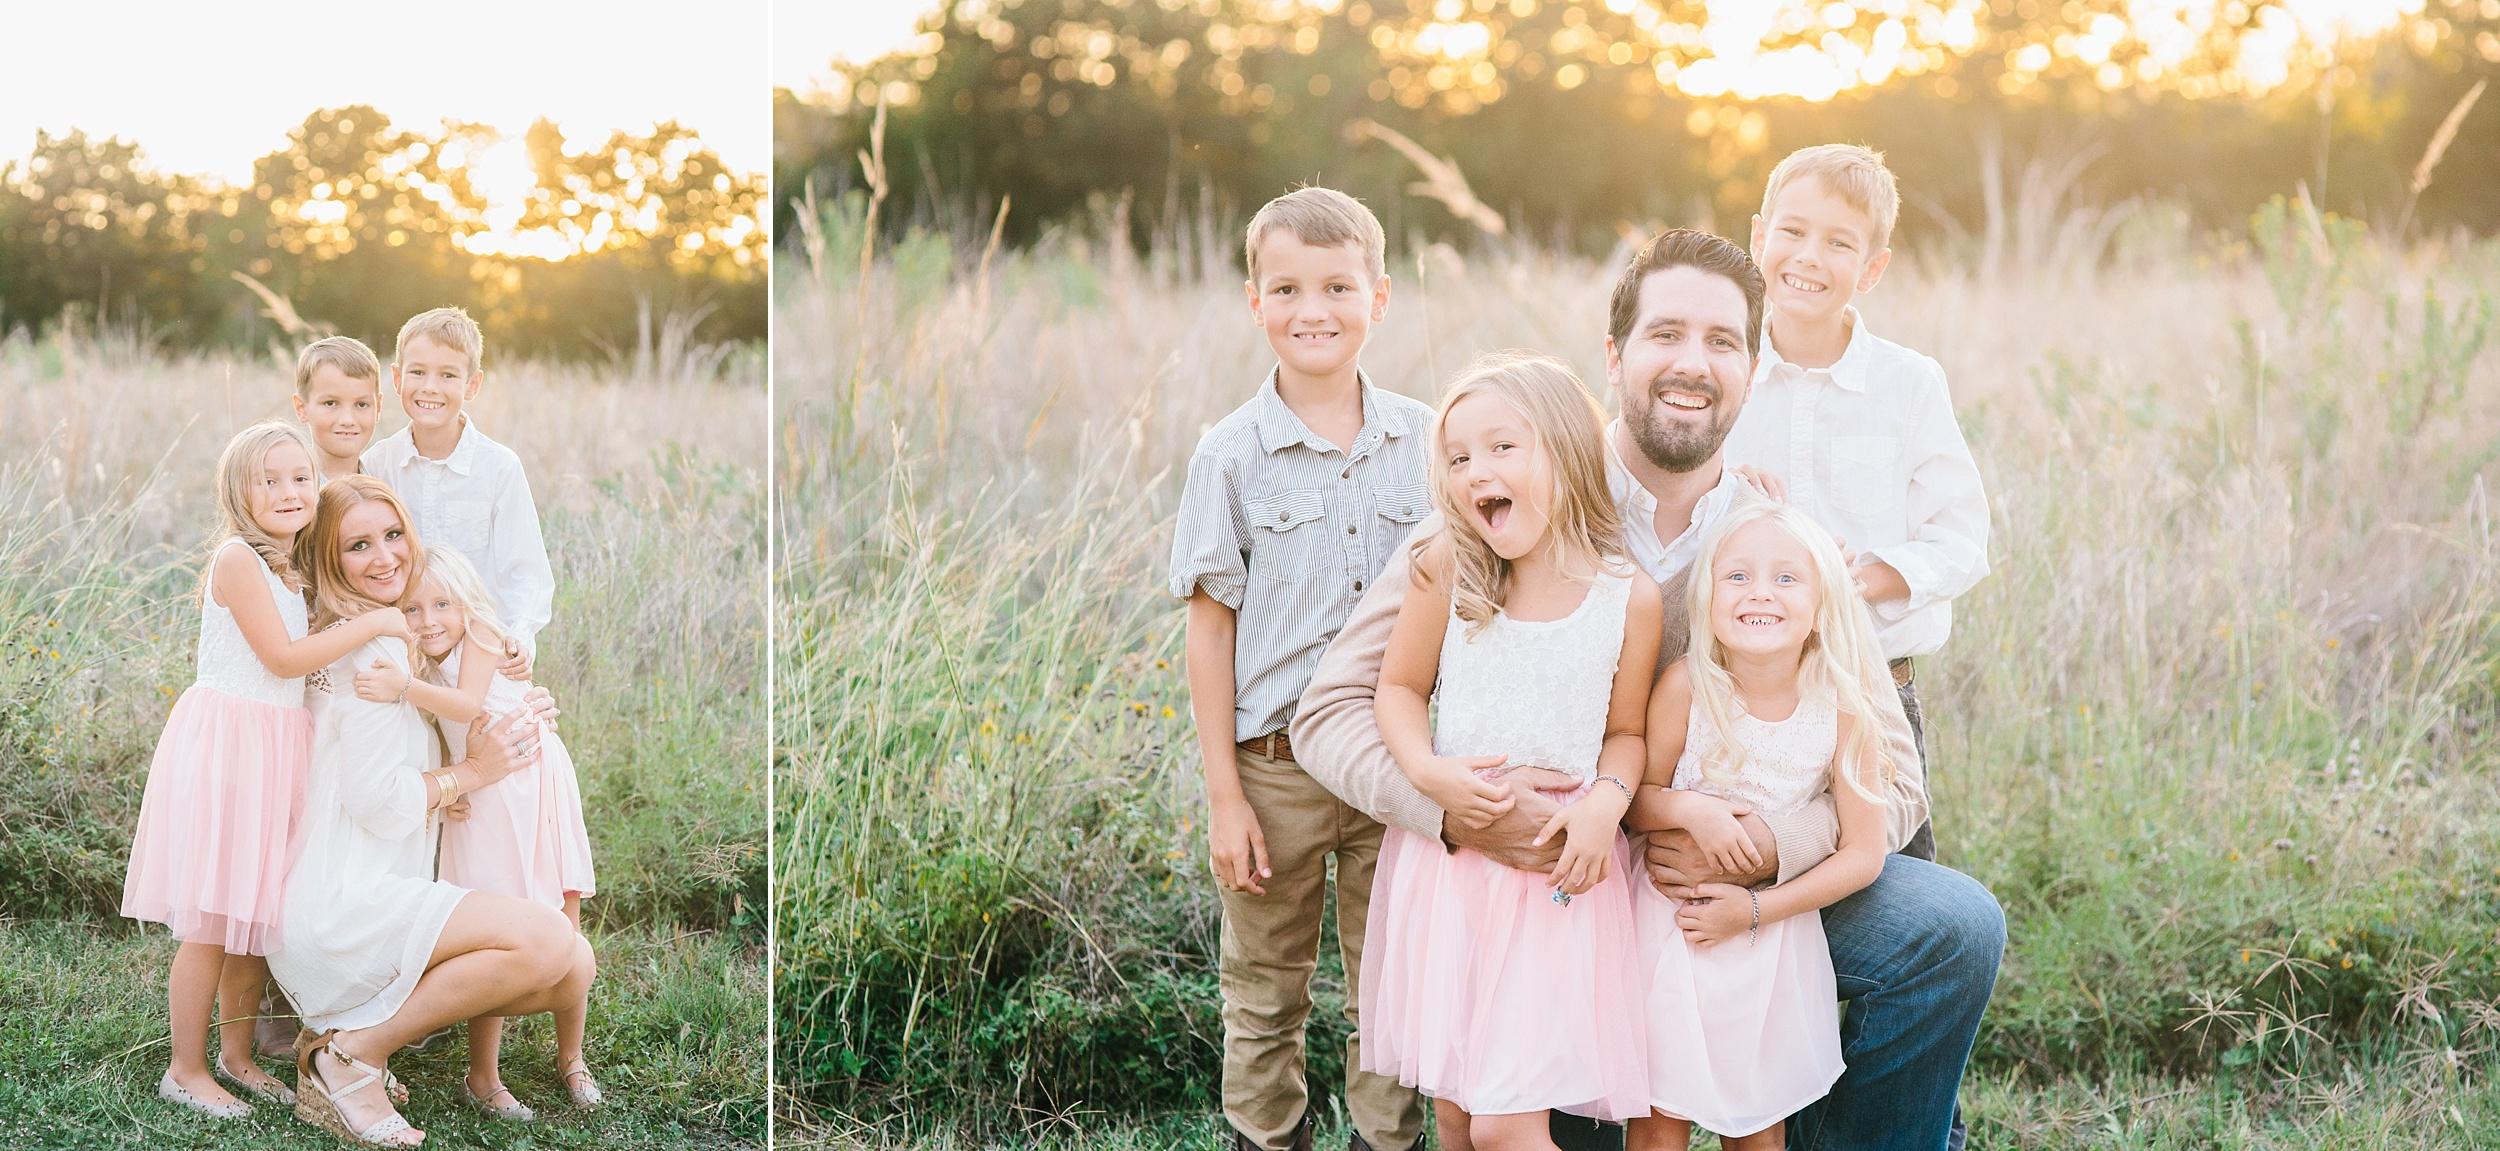 Austin Family Photographer 11.jpg